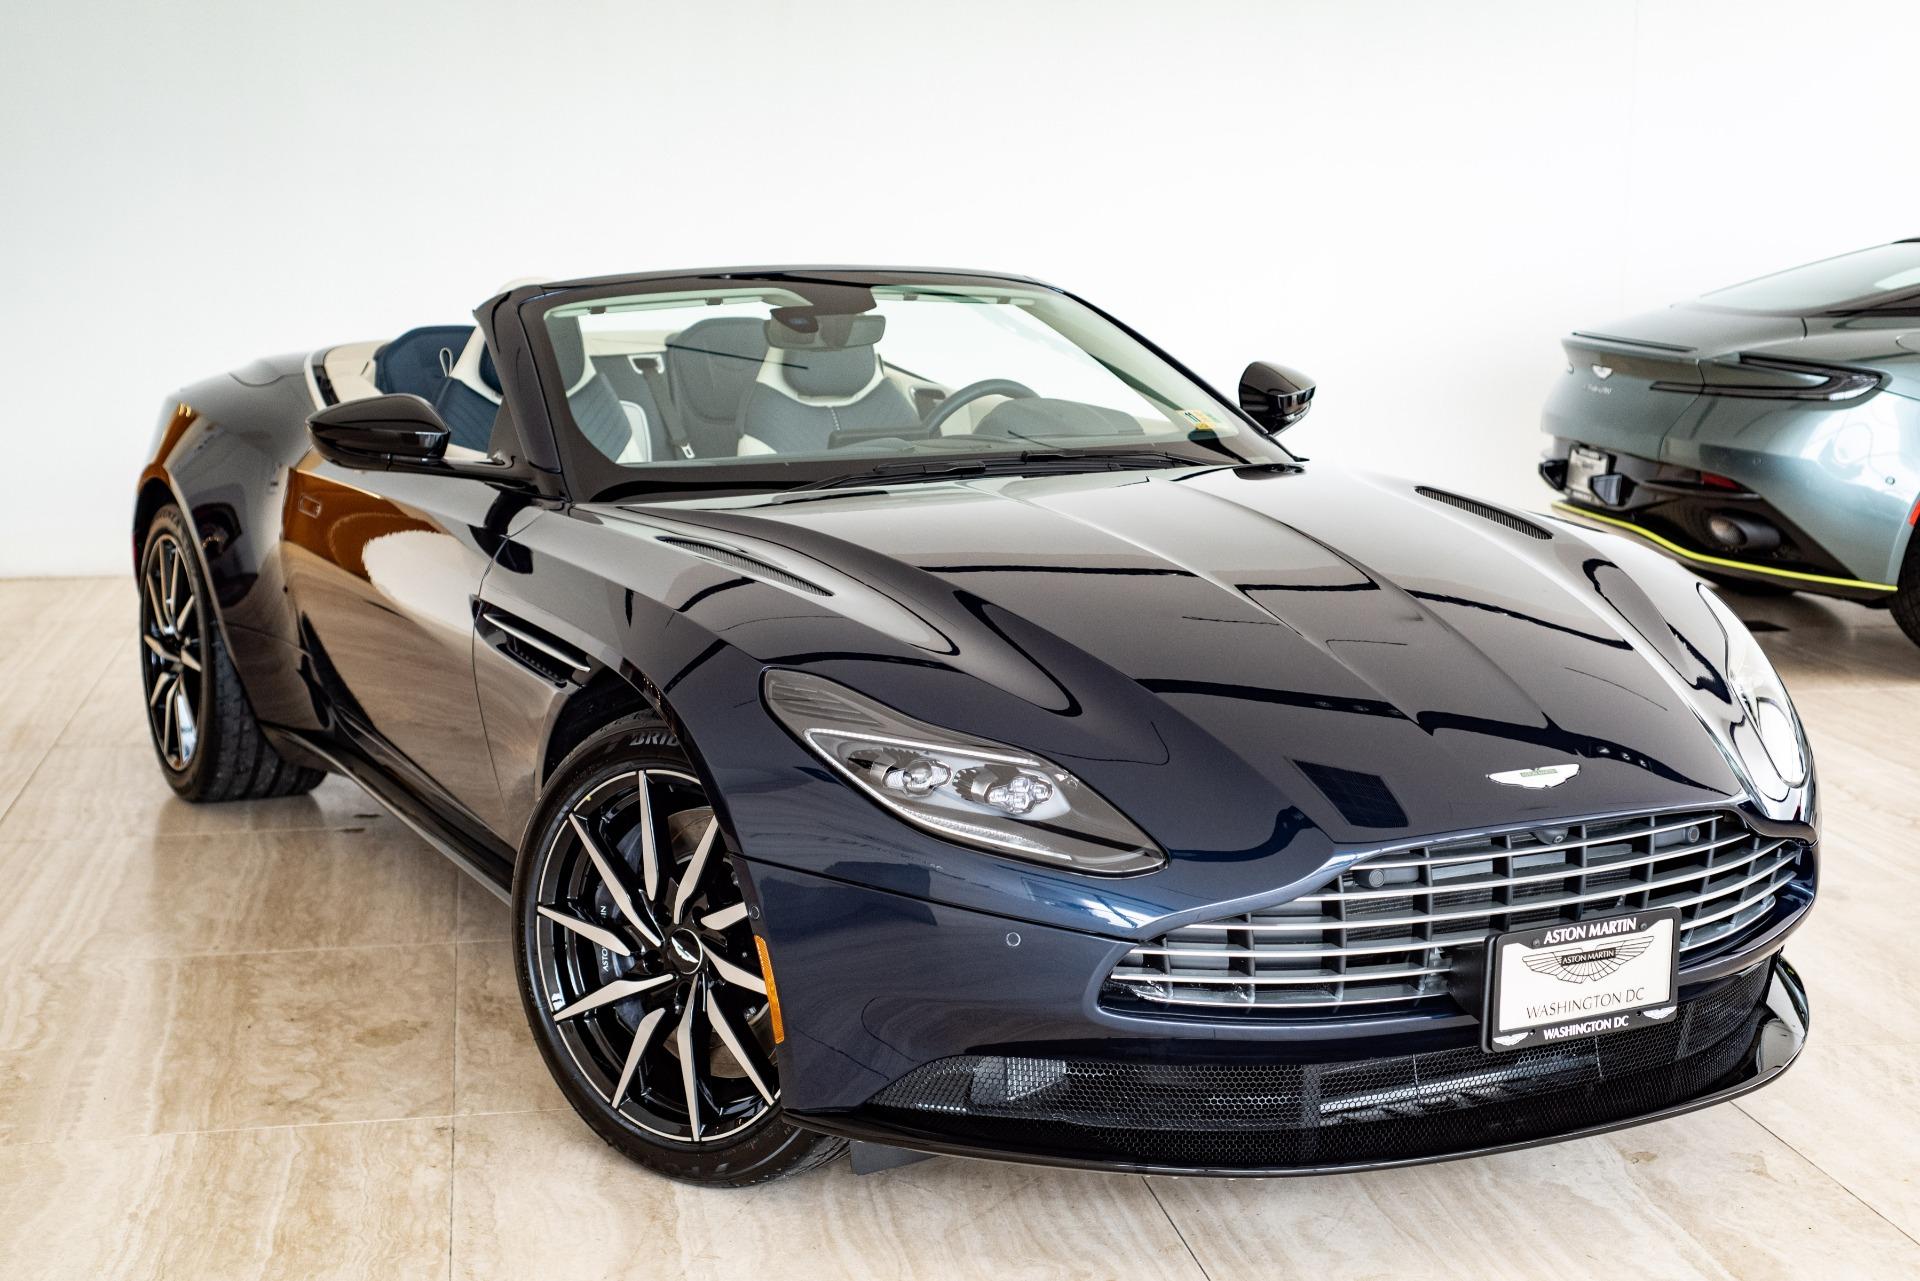 2019 Aston Martin Db11 Volante Stock 9nm06940 For Sale Near Vienna Va Va Aston Martin Dealer